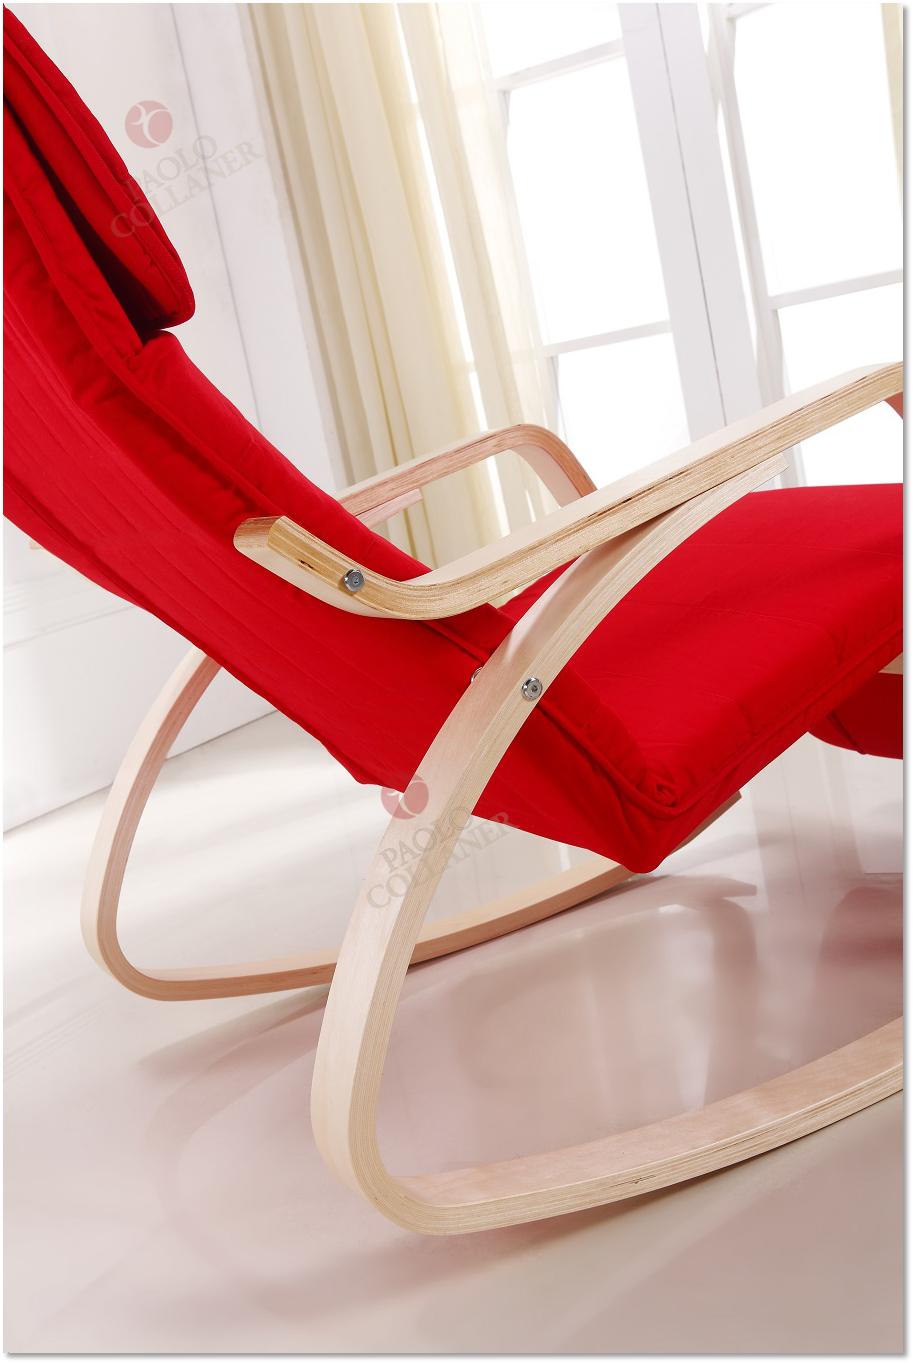 relaxstuhl schwingsessel schwingstuhl schaukelstuhl stuhl st hle rot ebay. Black Bedroom Furniture Sets. Home Design Ideas